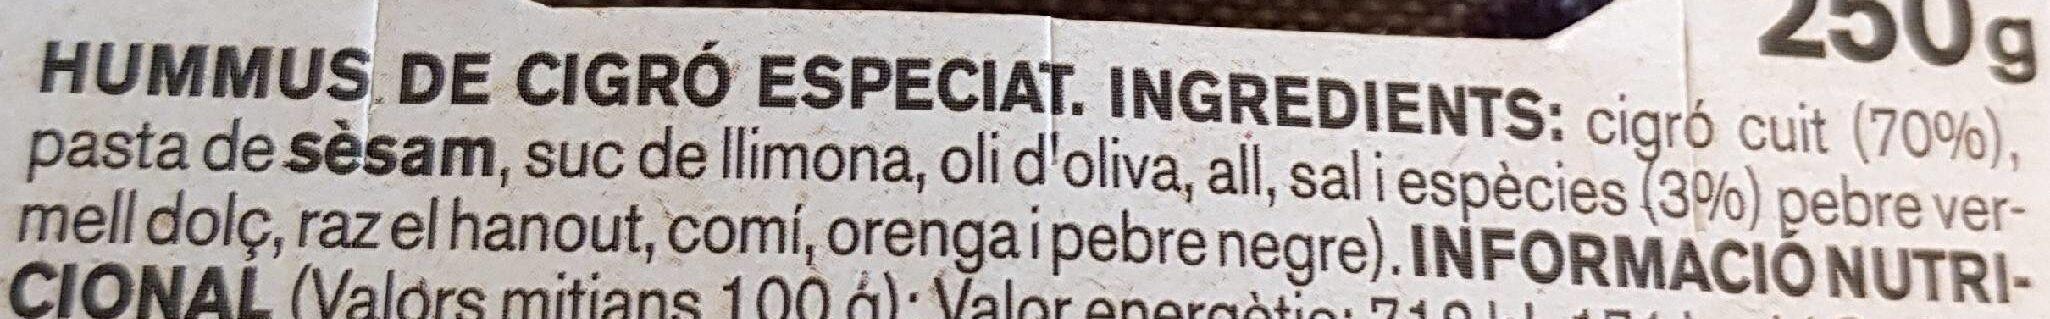 Hummus cigro - Ingrédients